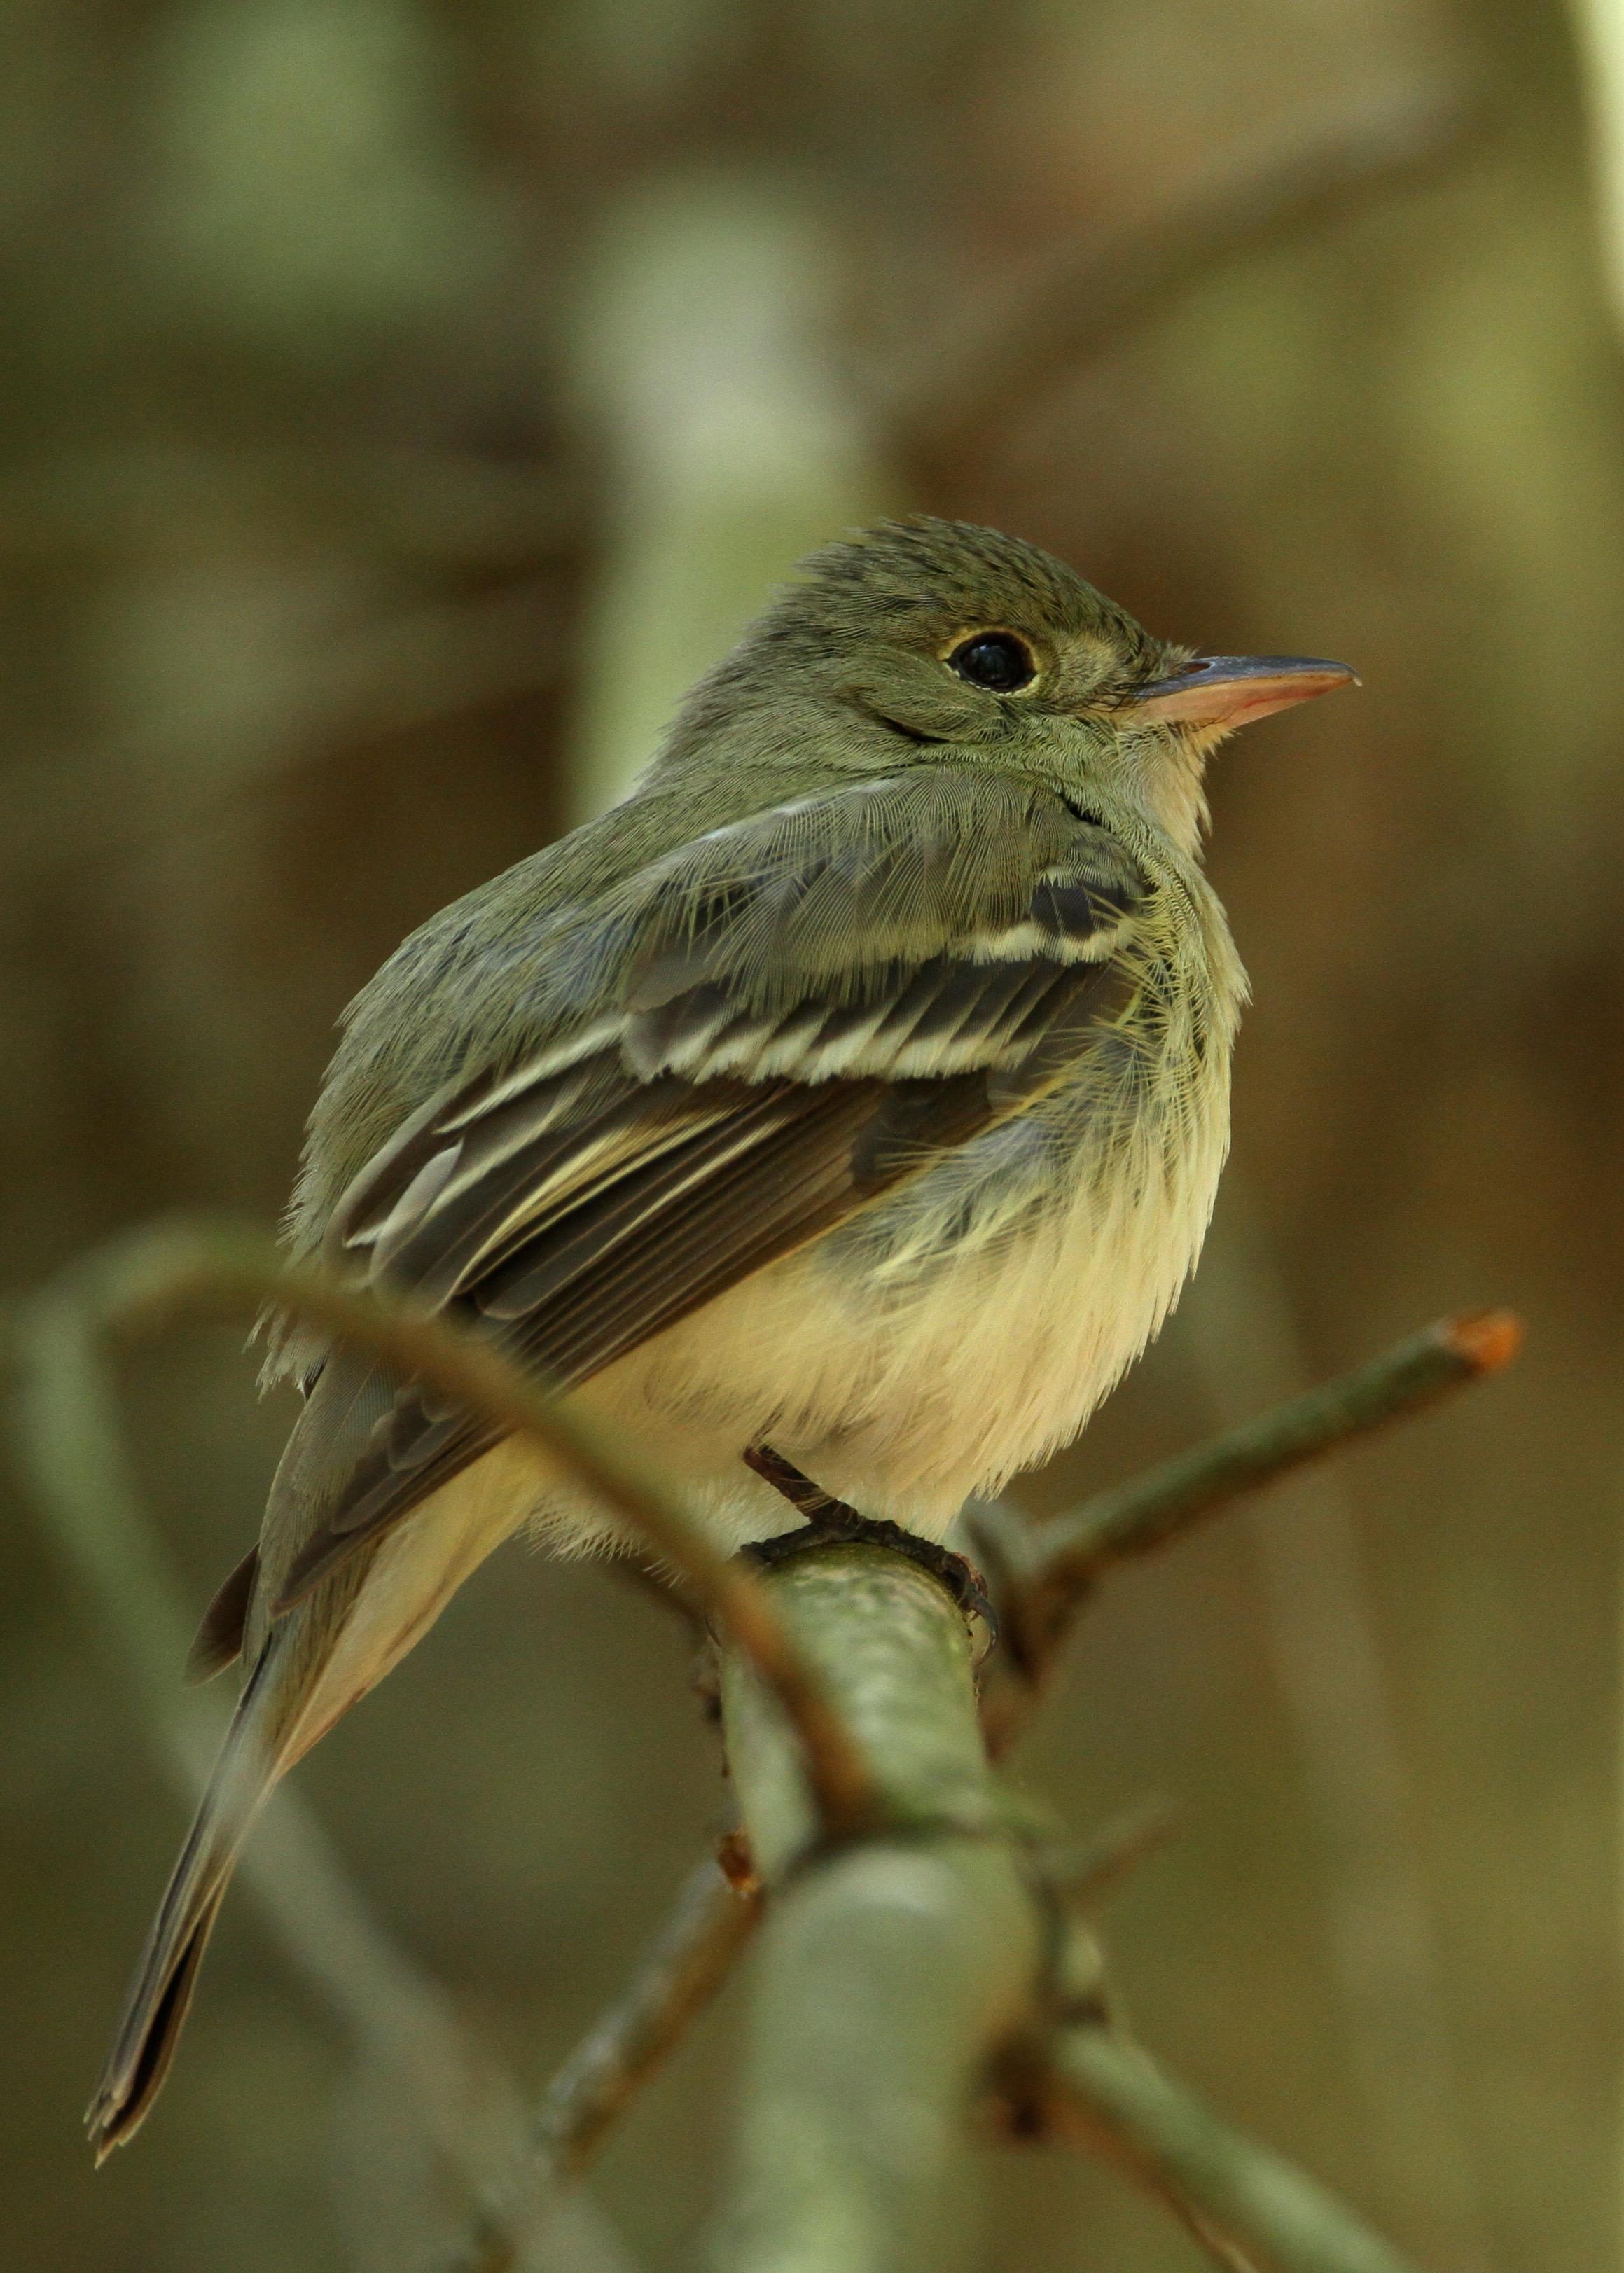 Acadian Flycatcher, Belleplain, New Jersey